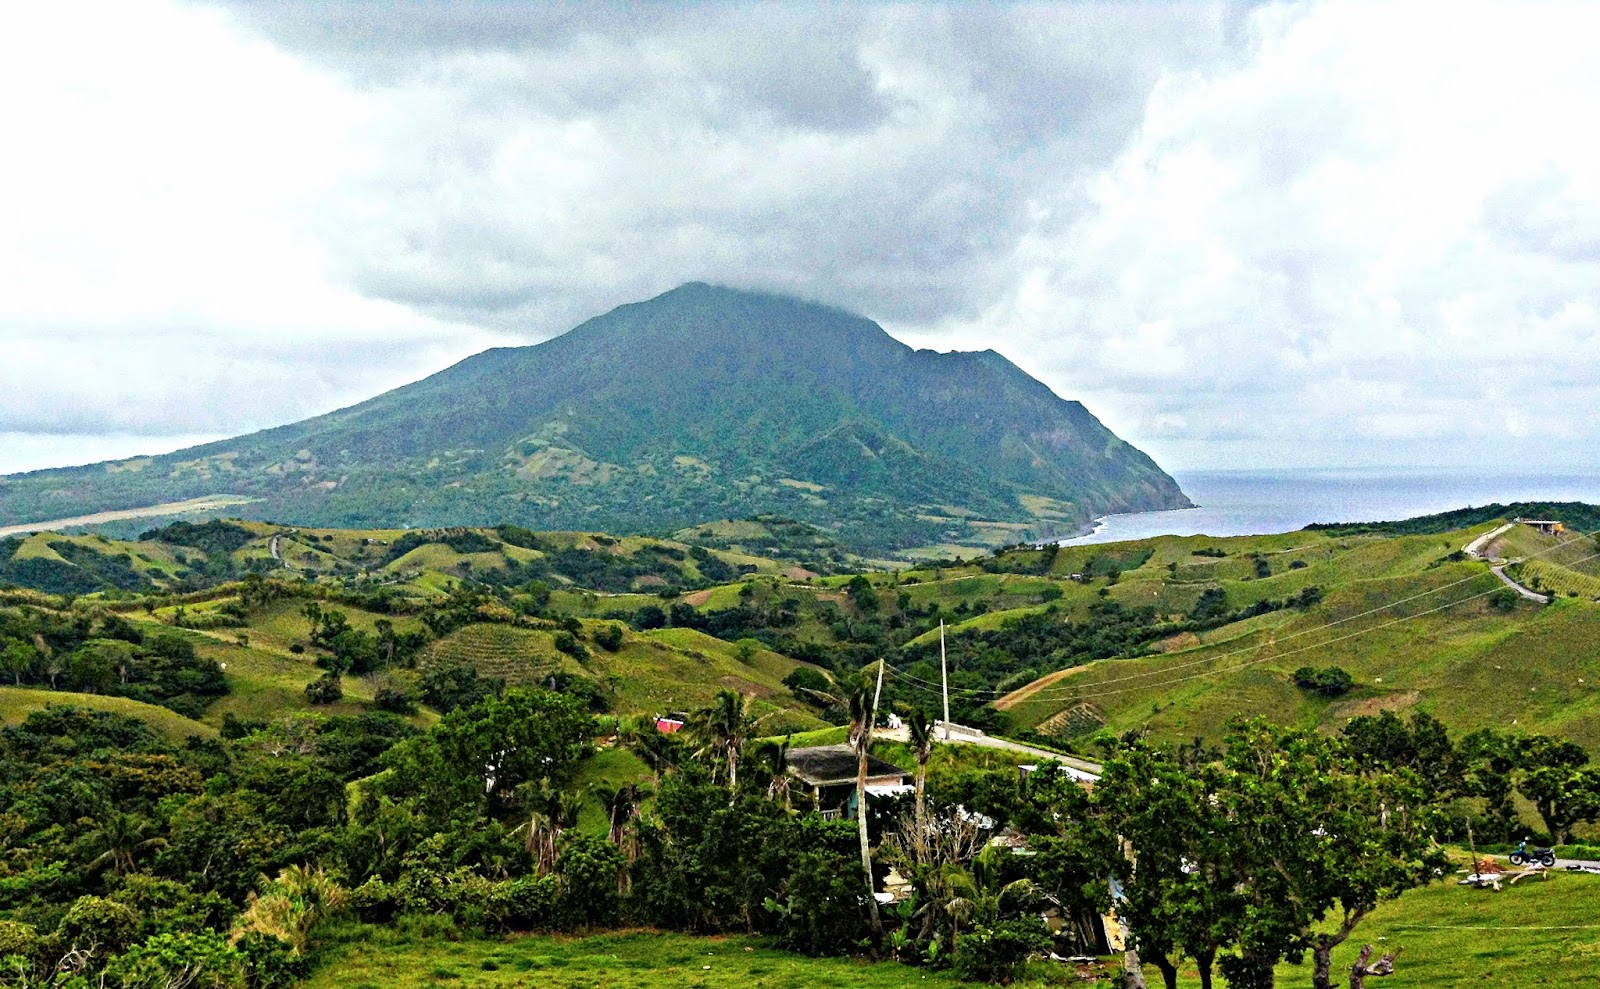 Mount Iraya Batanes